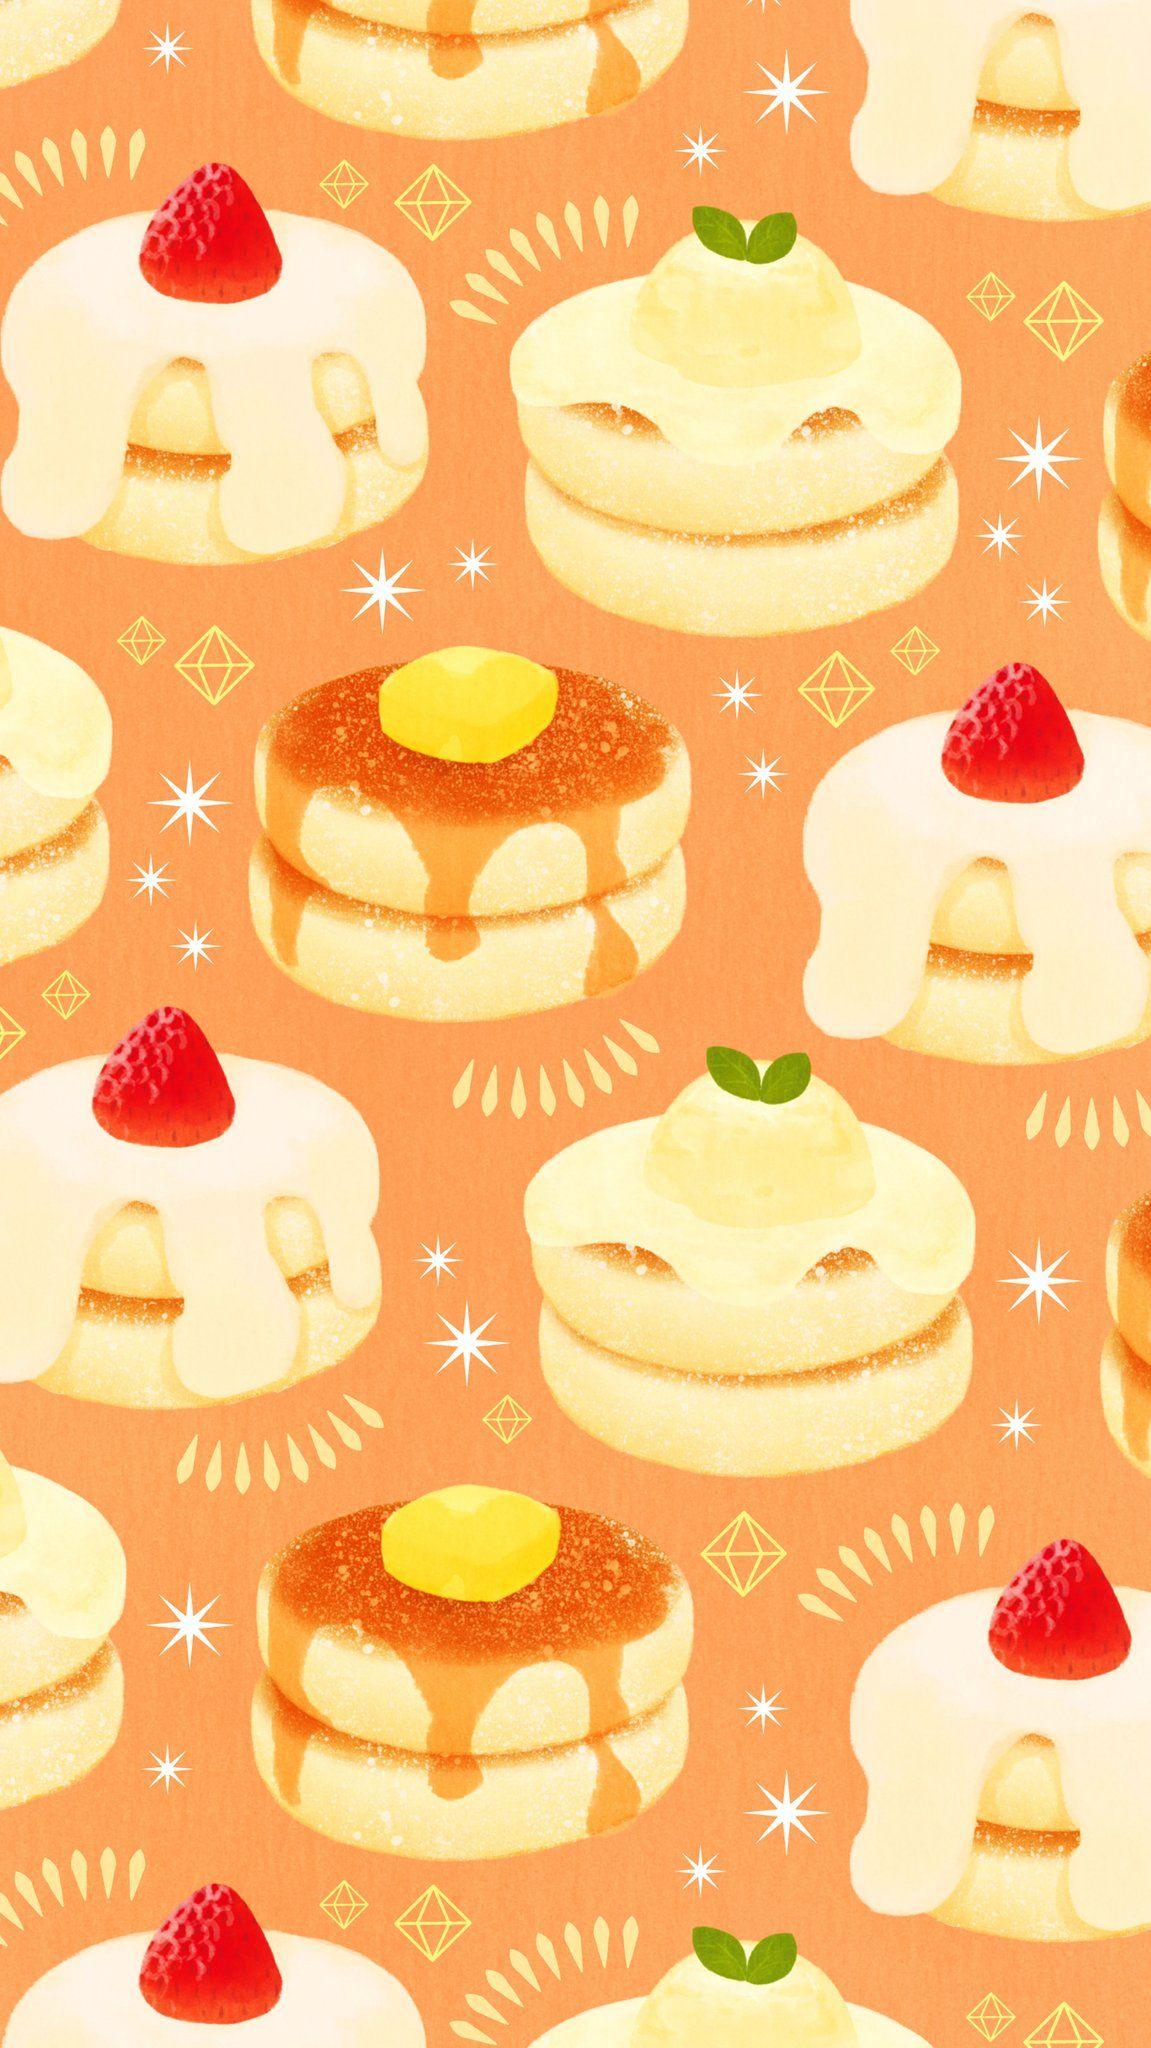 Omiyu みゆき In Food Illustrations Cute Food Art Food Wallpaper